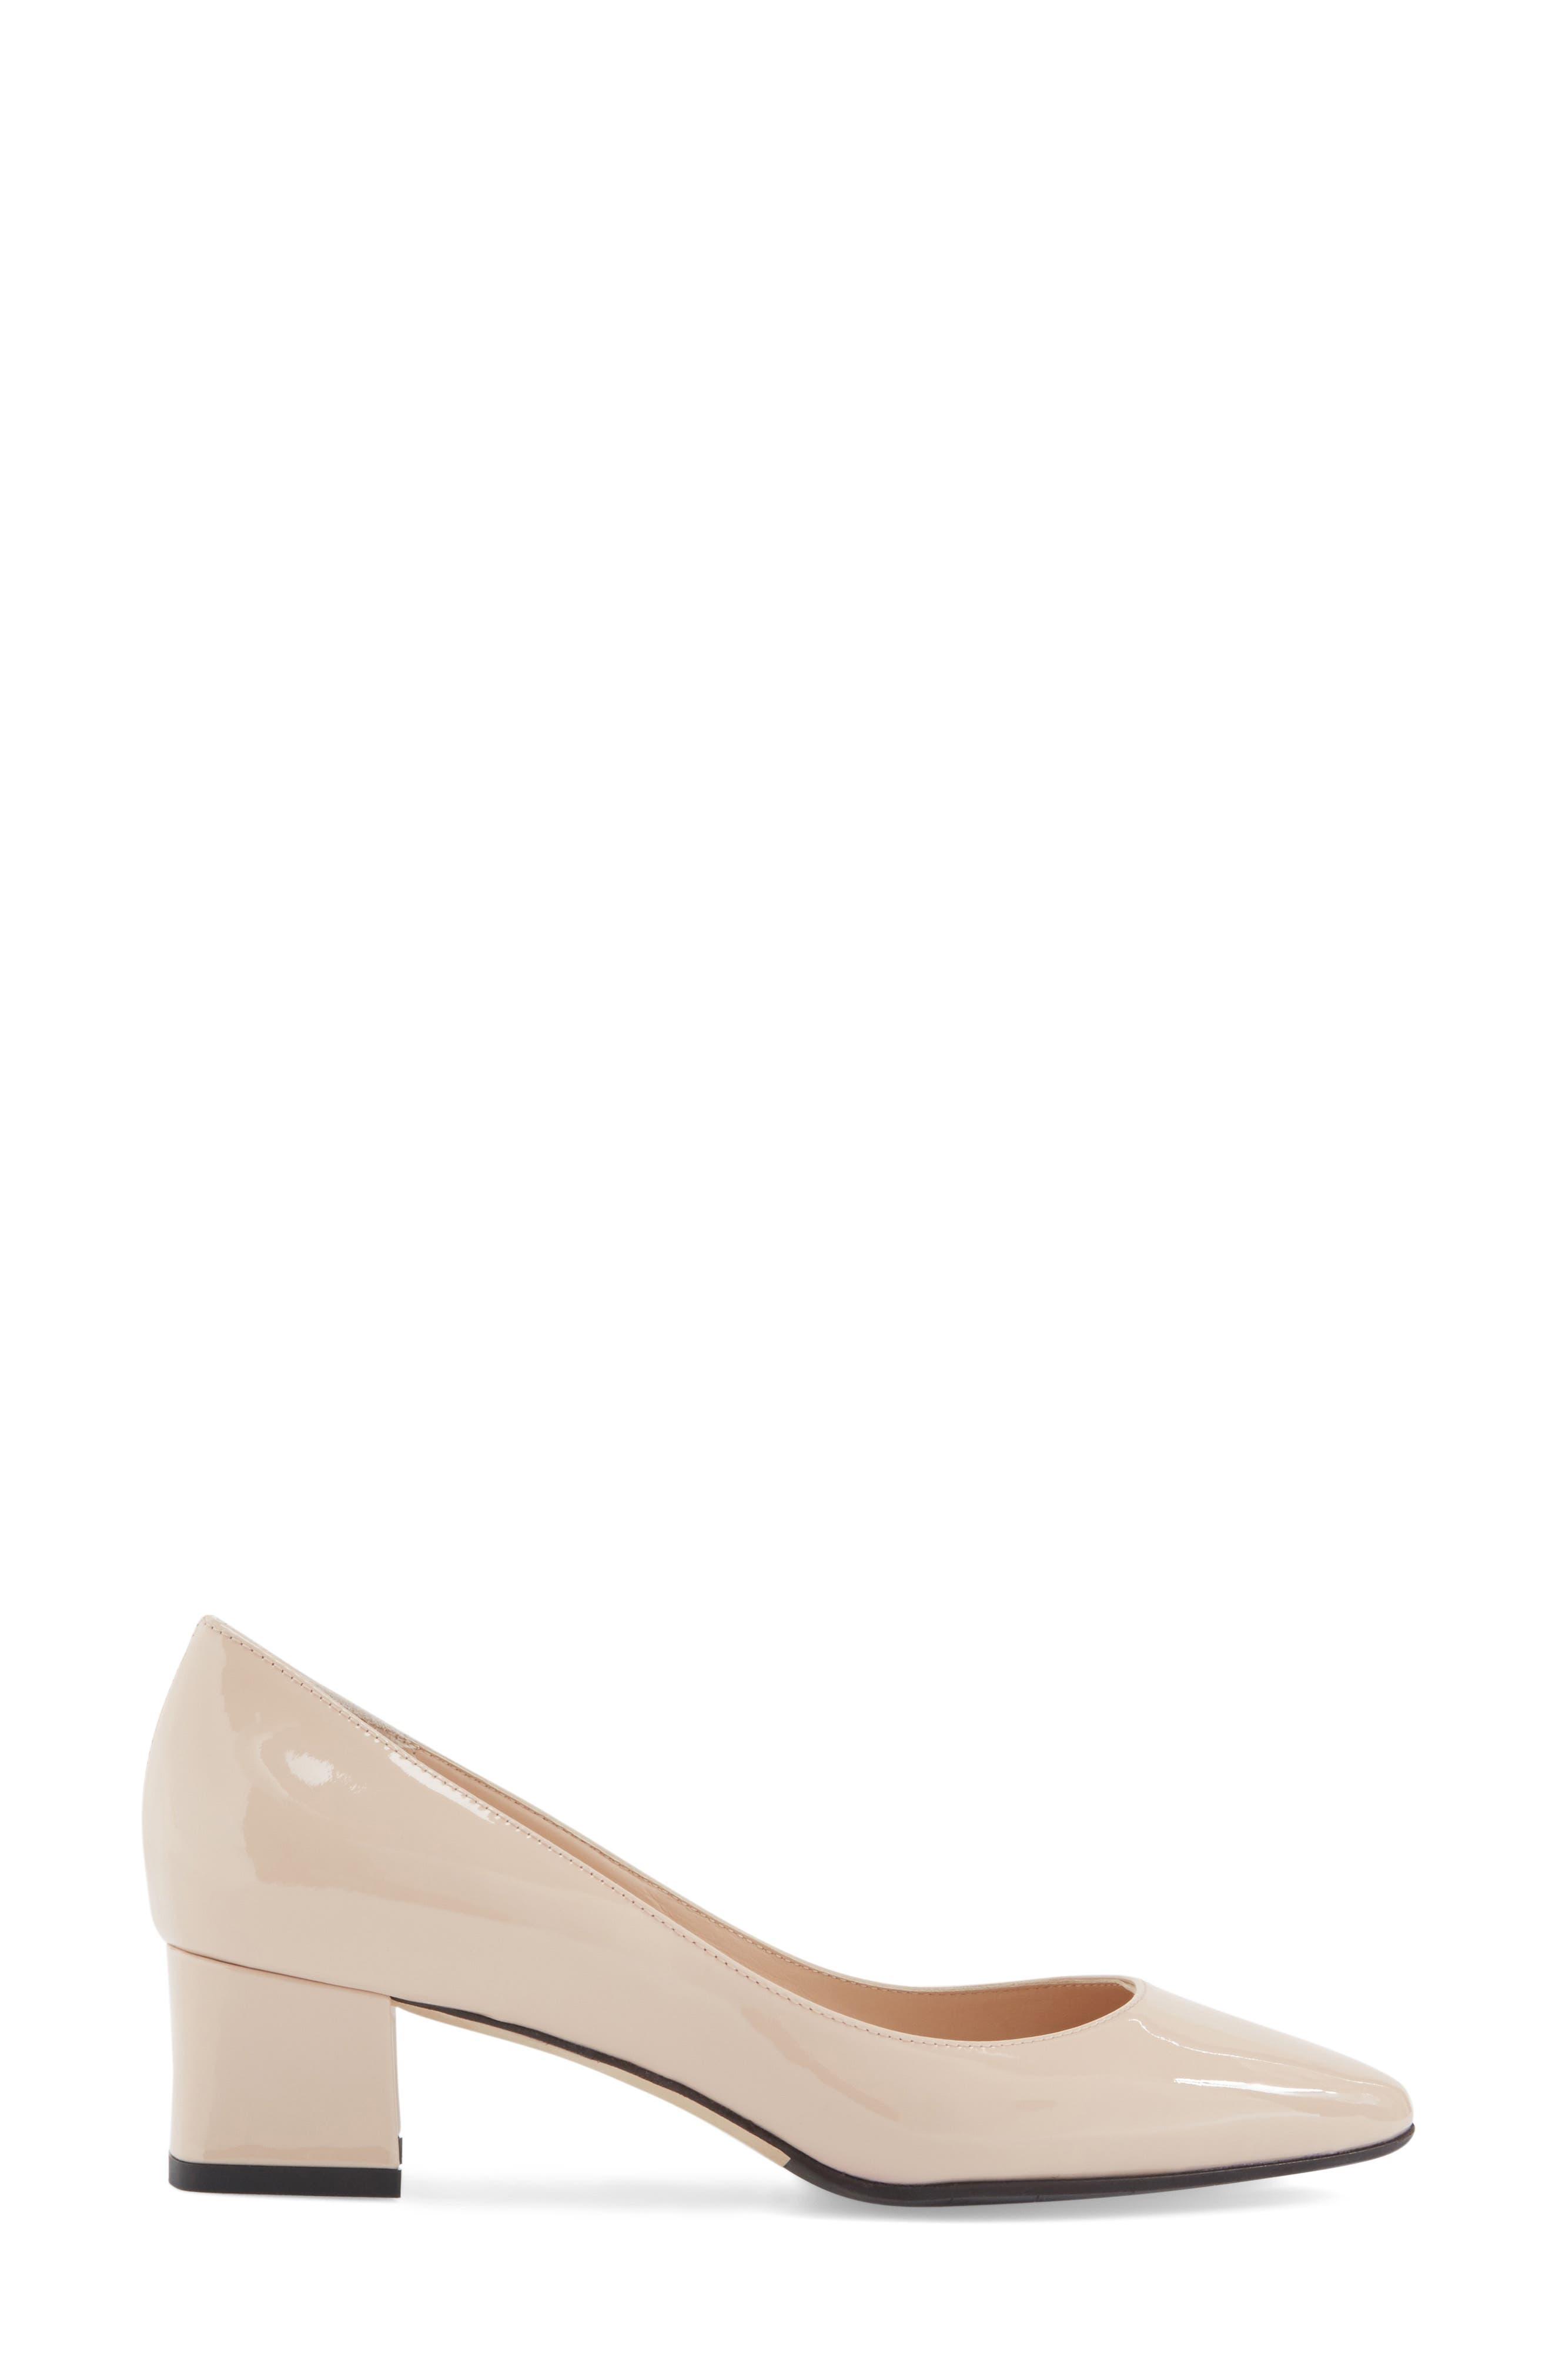 'Pheobe' Weatherproof Almond Toe Pump,                             Alternate thumbnail 109, color,